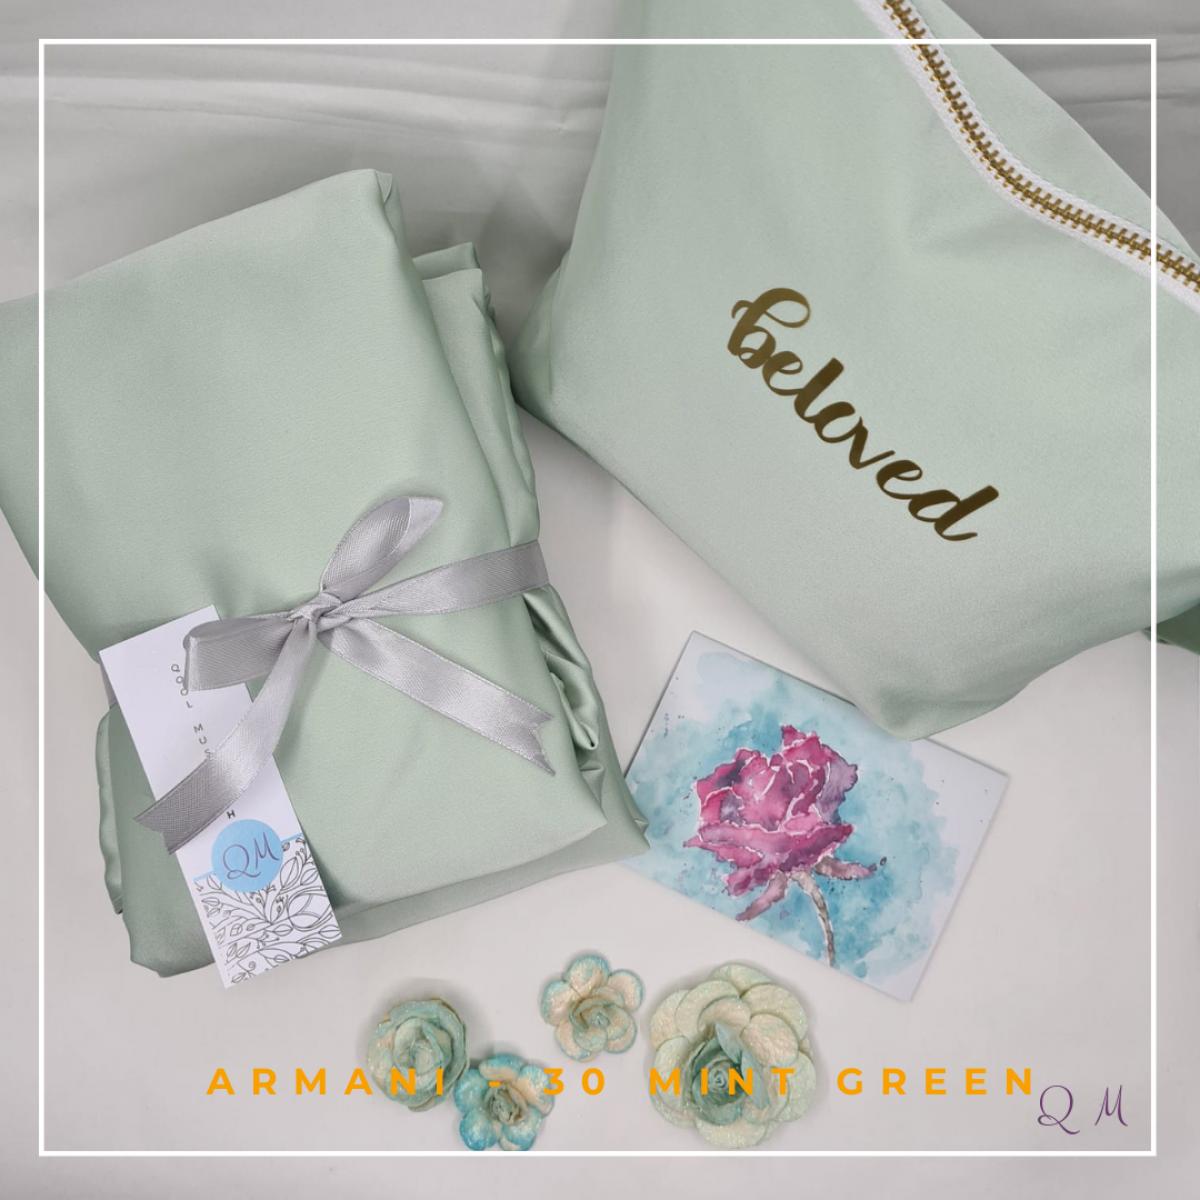 30. Telekung/Mukena Armani Silk - Mint Green - Qool Muslimah